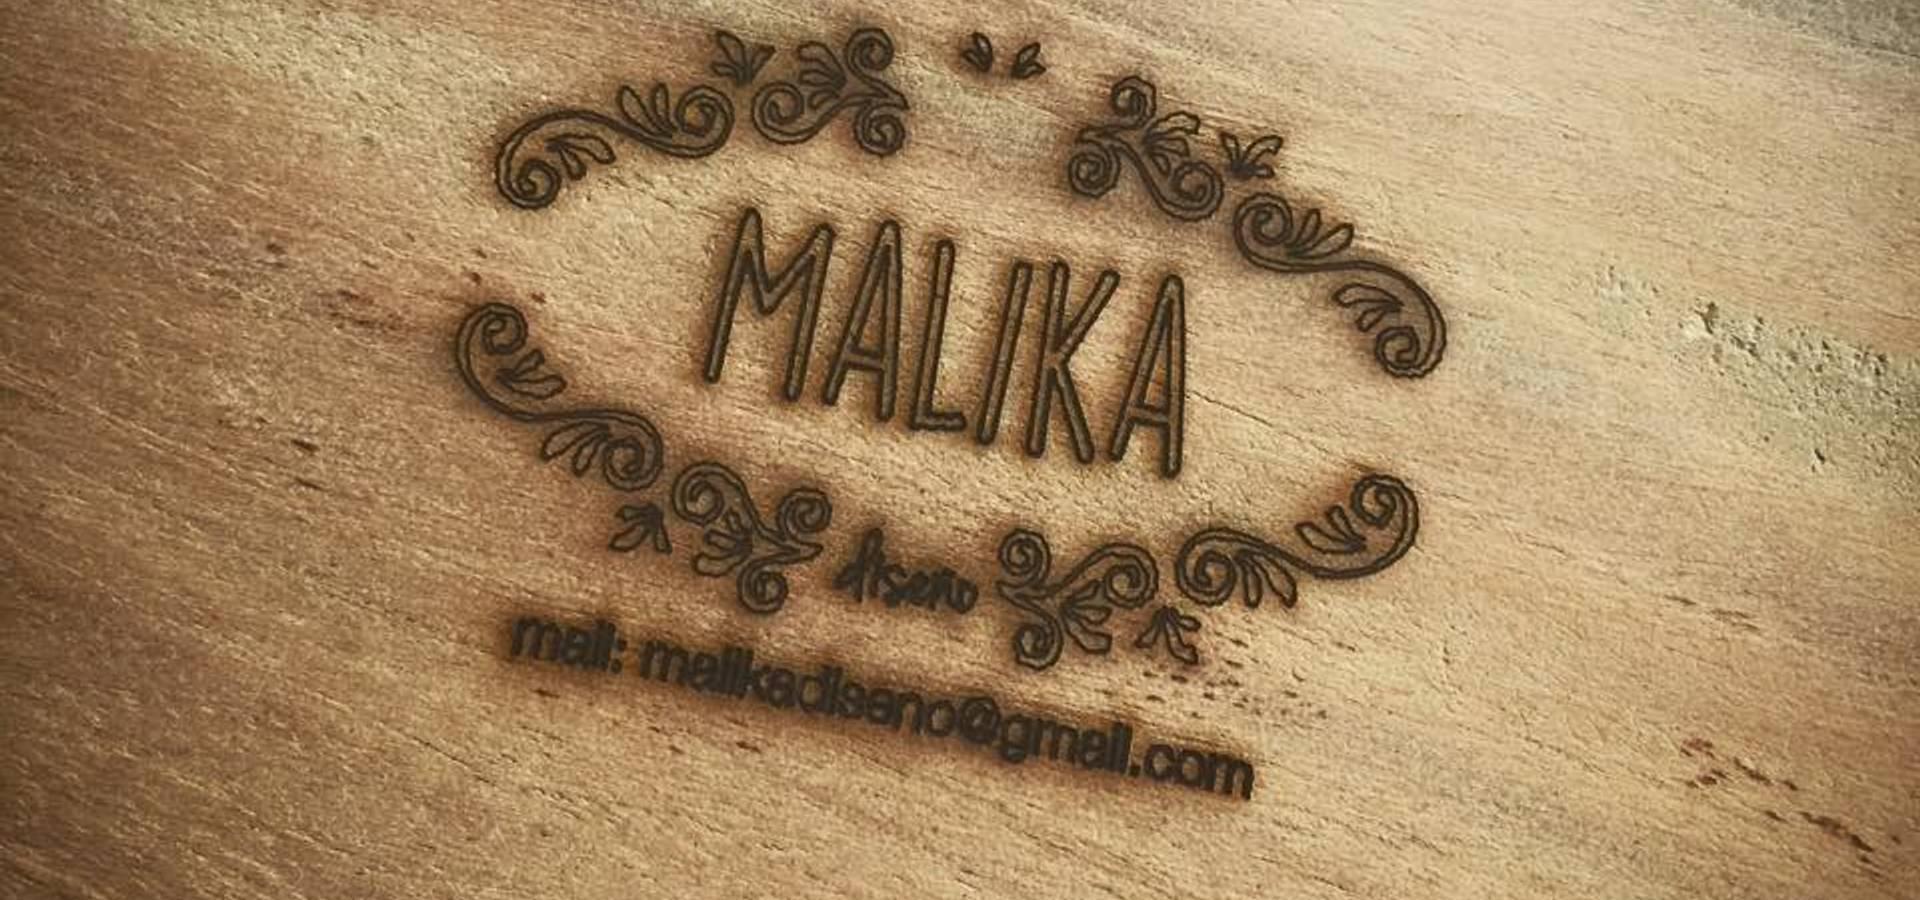 Malika Diseno